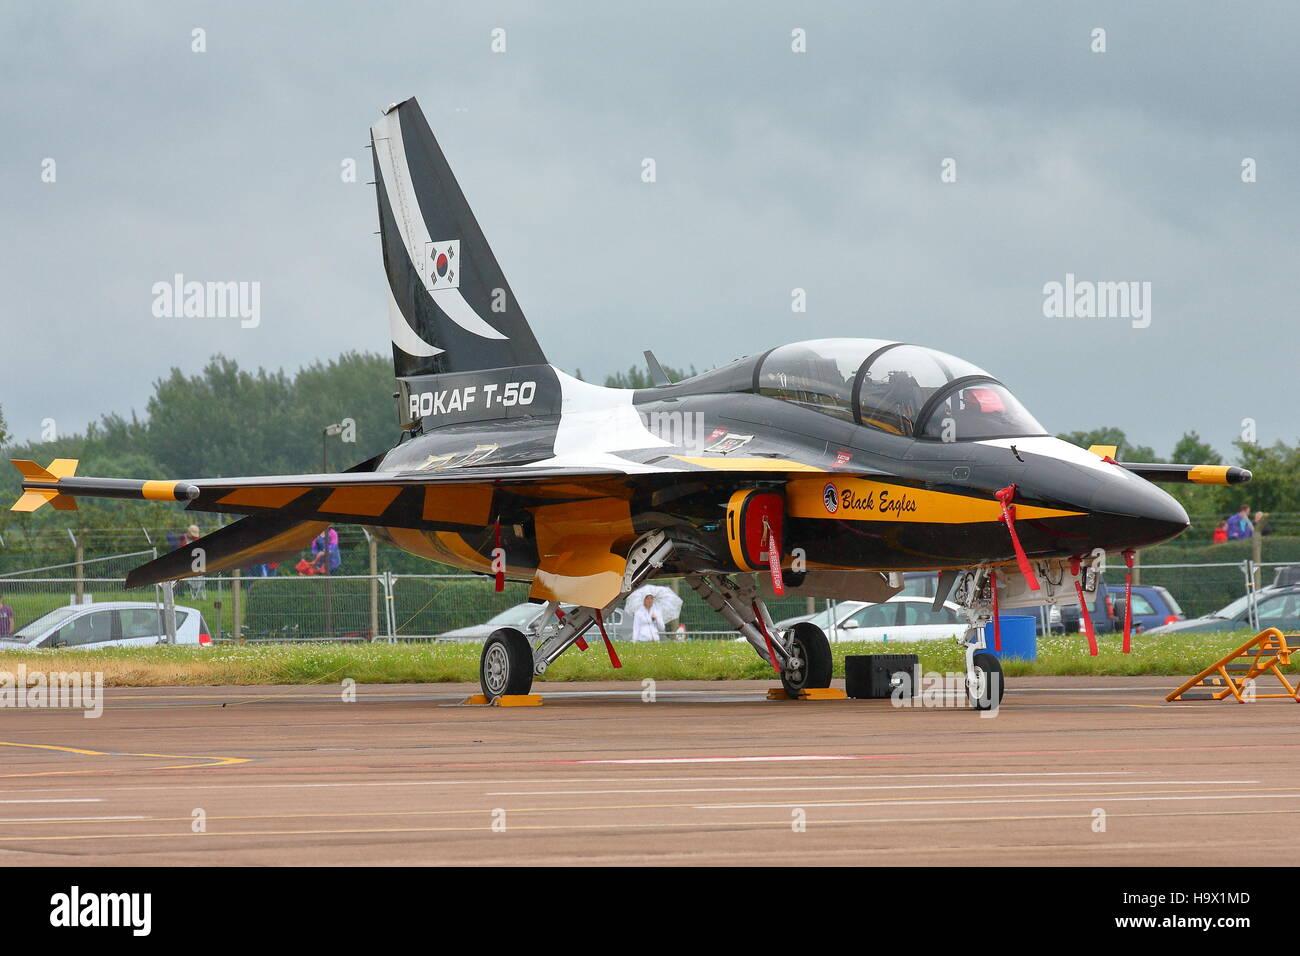 Korean Aerospace T-50 Golden Eagle at RAF Fairford RIAT Airshow 2012 - Stock Image